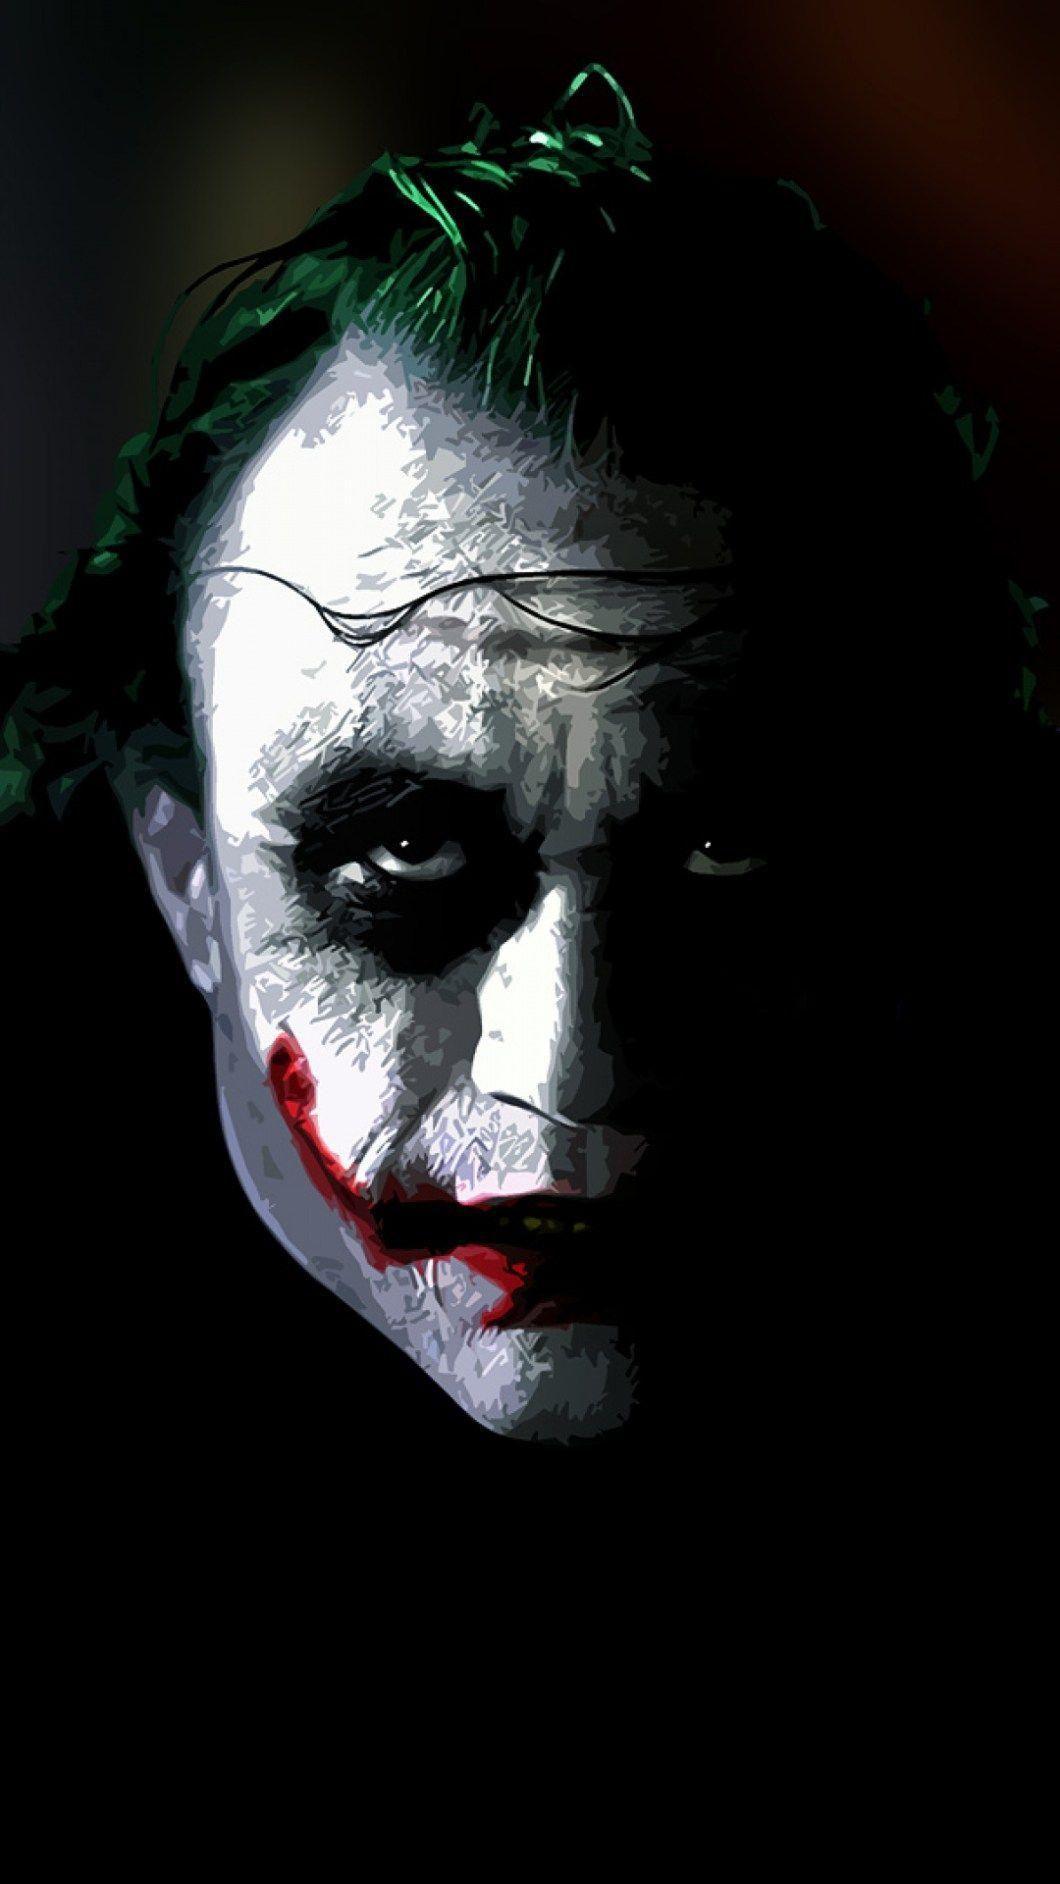 Joker Wallpaper Android Mywallpapers Site In 2021 Joker Wallpapers Joker Pics Joker Dark Knight Joker 2021 joker wallpaper hd download